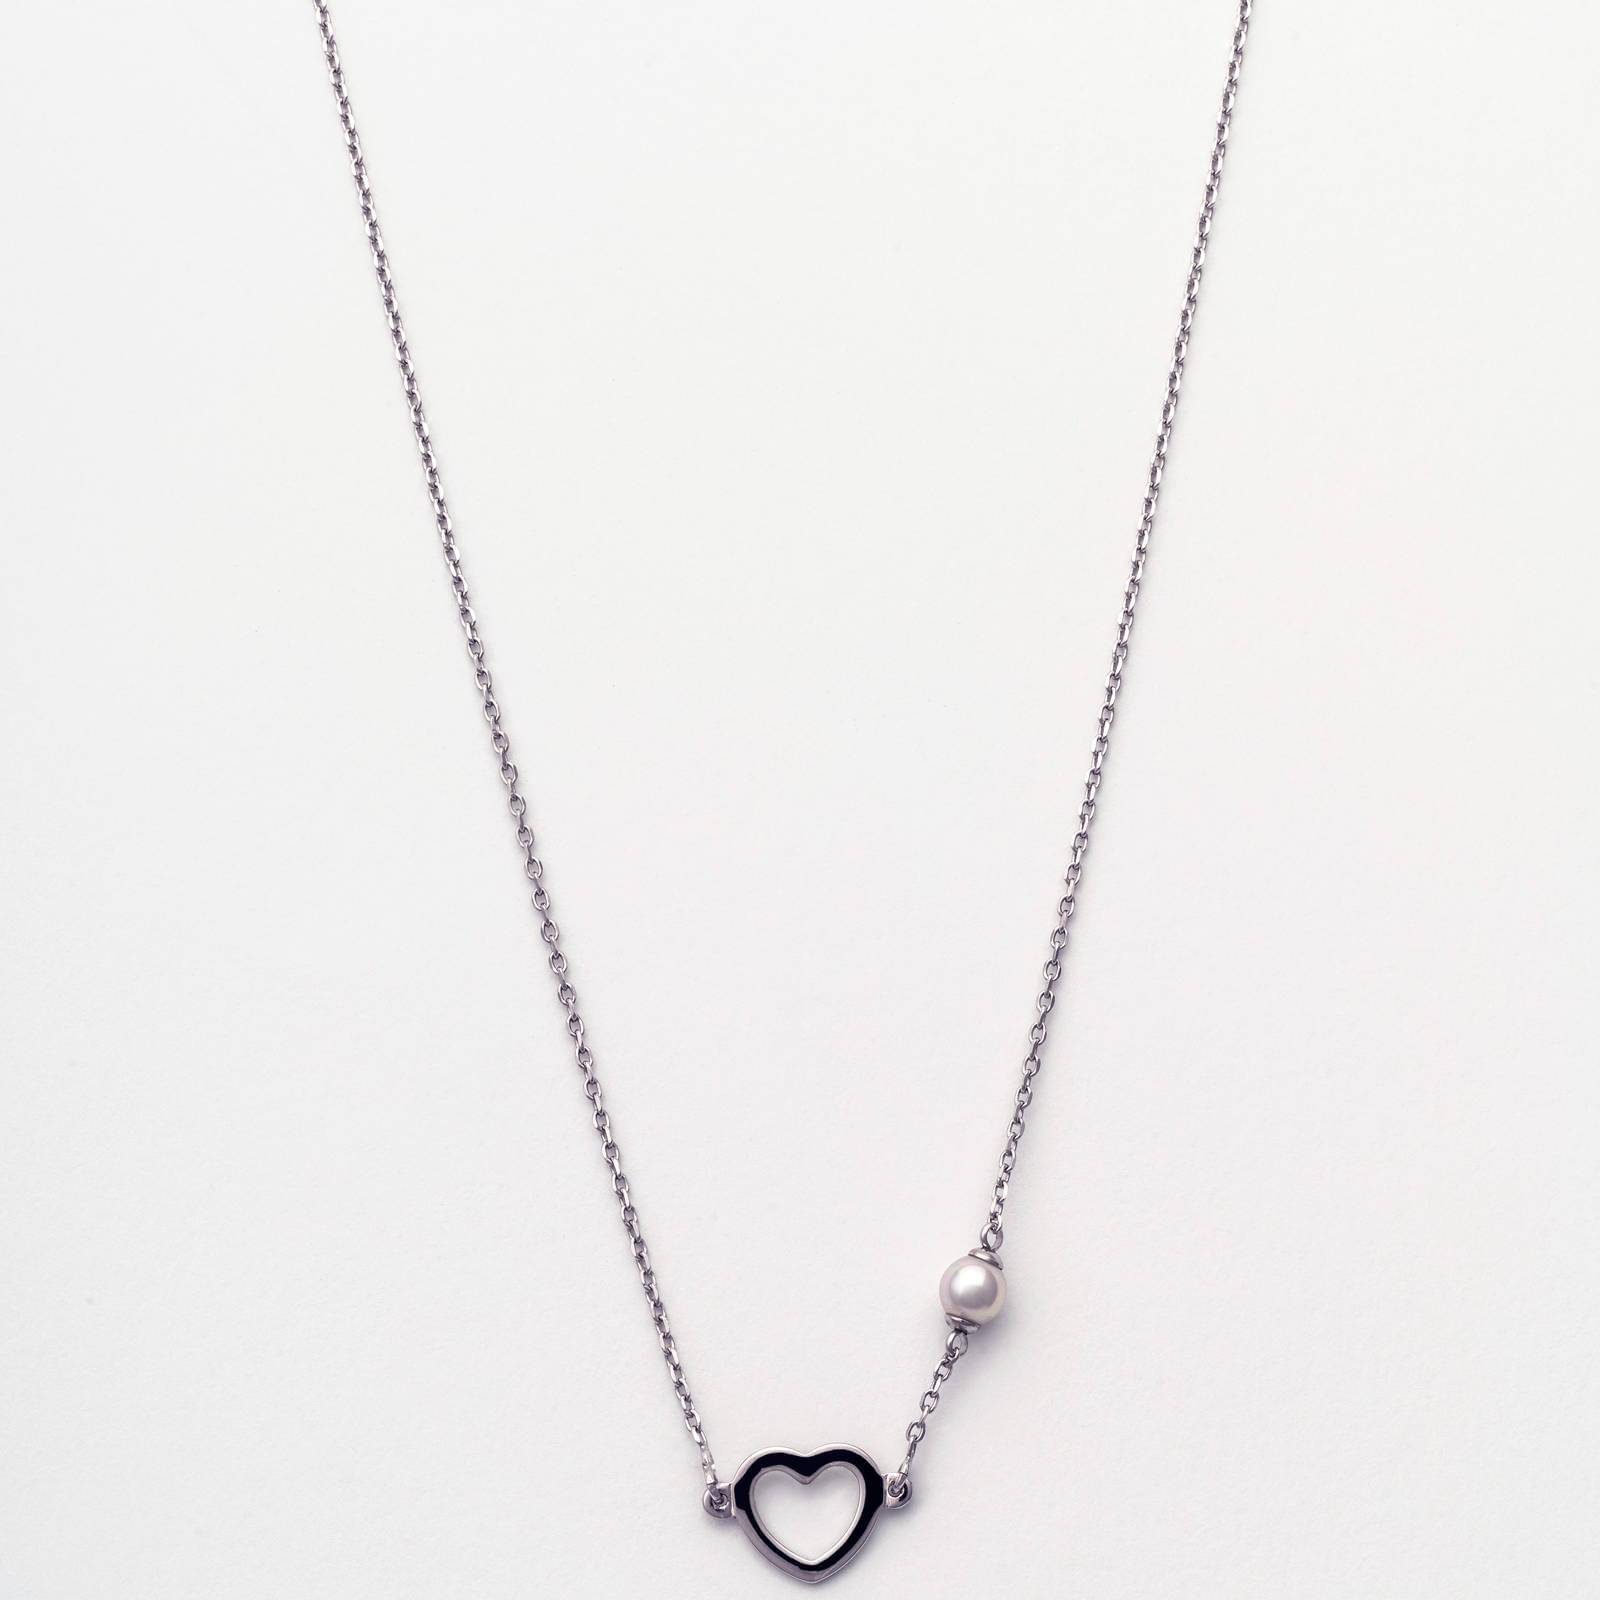 Colar Heart - 16414.01.2